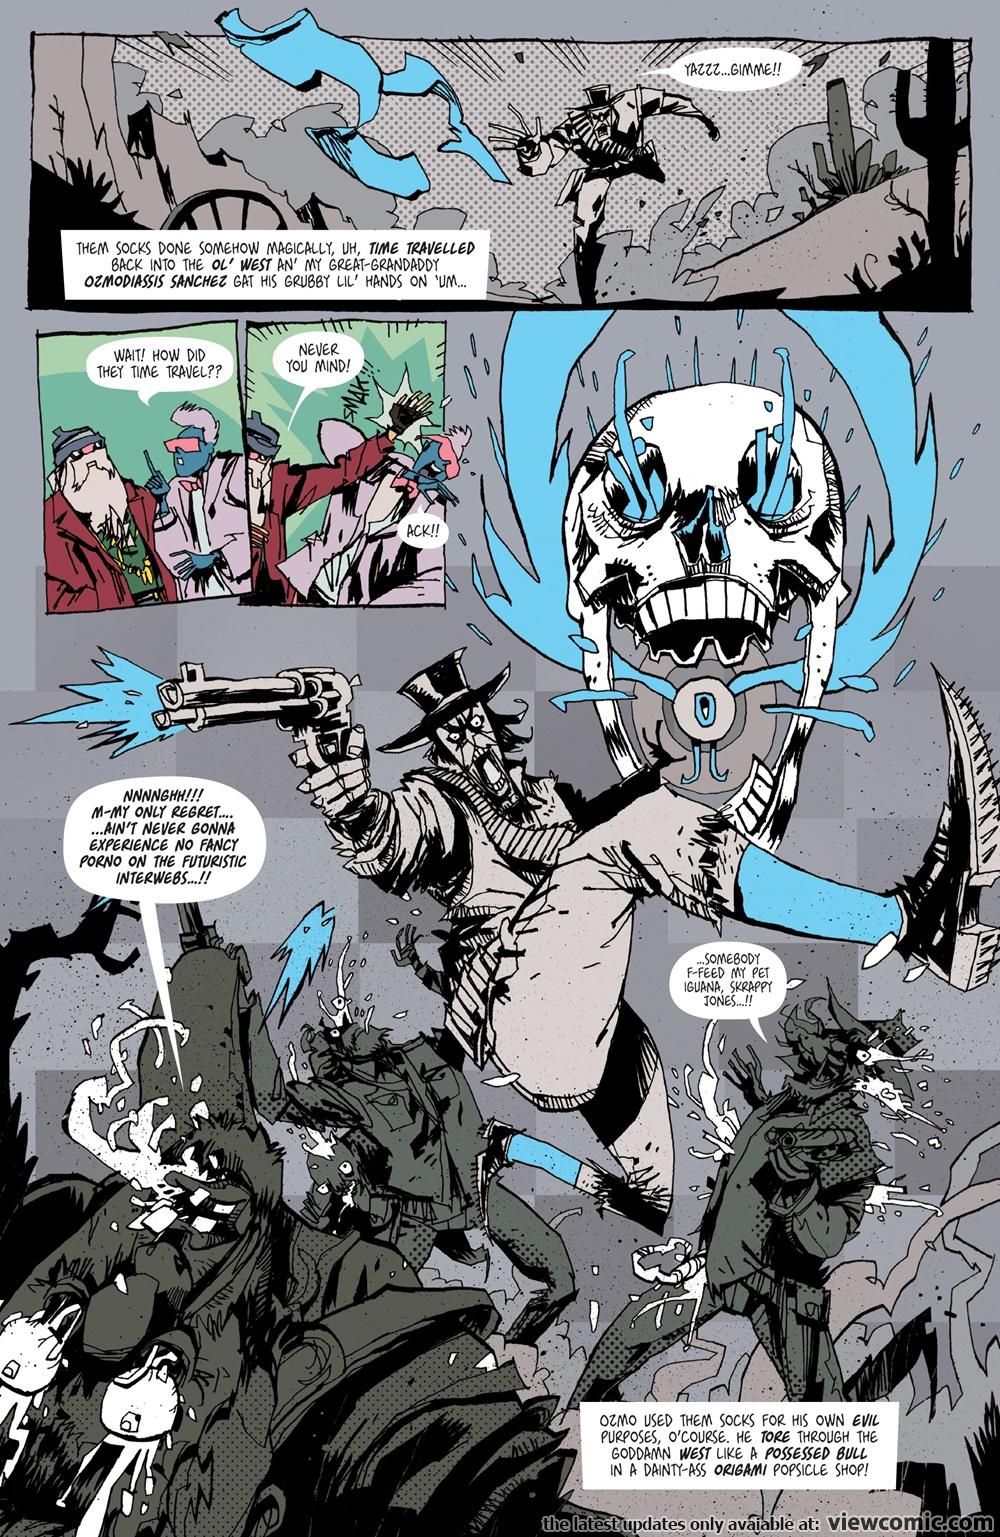 Grrl Scouts – Magic Socks 002 (2017)  | Vietcomic.net reading comics online for free